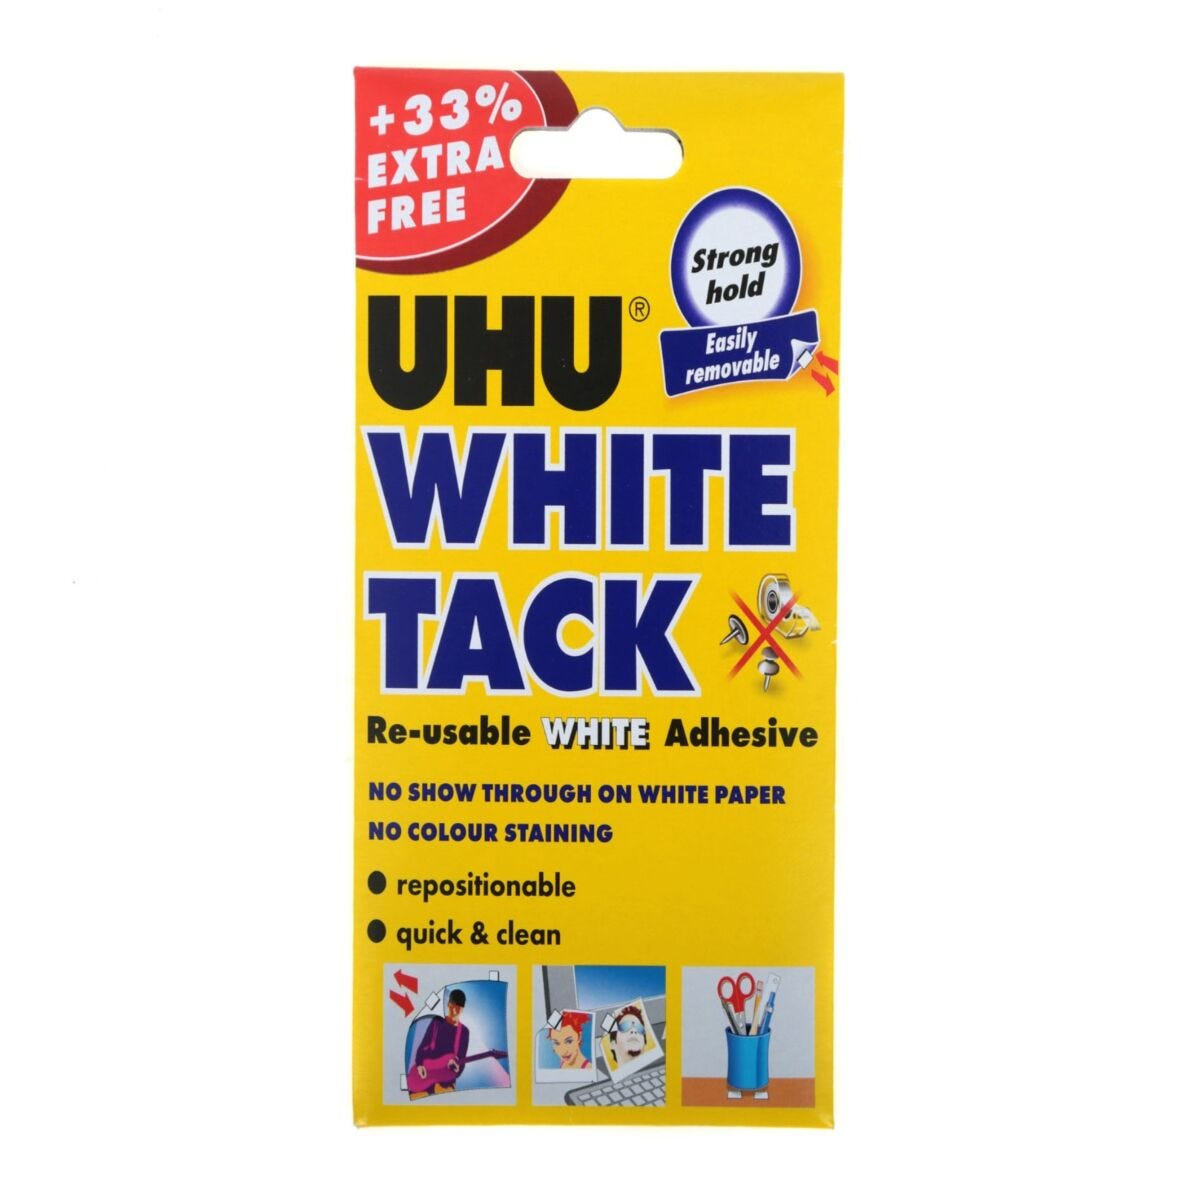 UHU White Tack Handy 33 Percent Extra Free